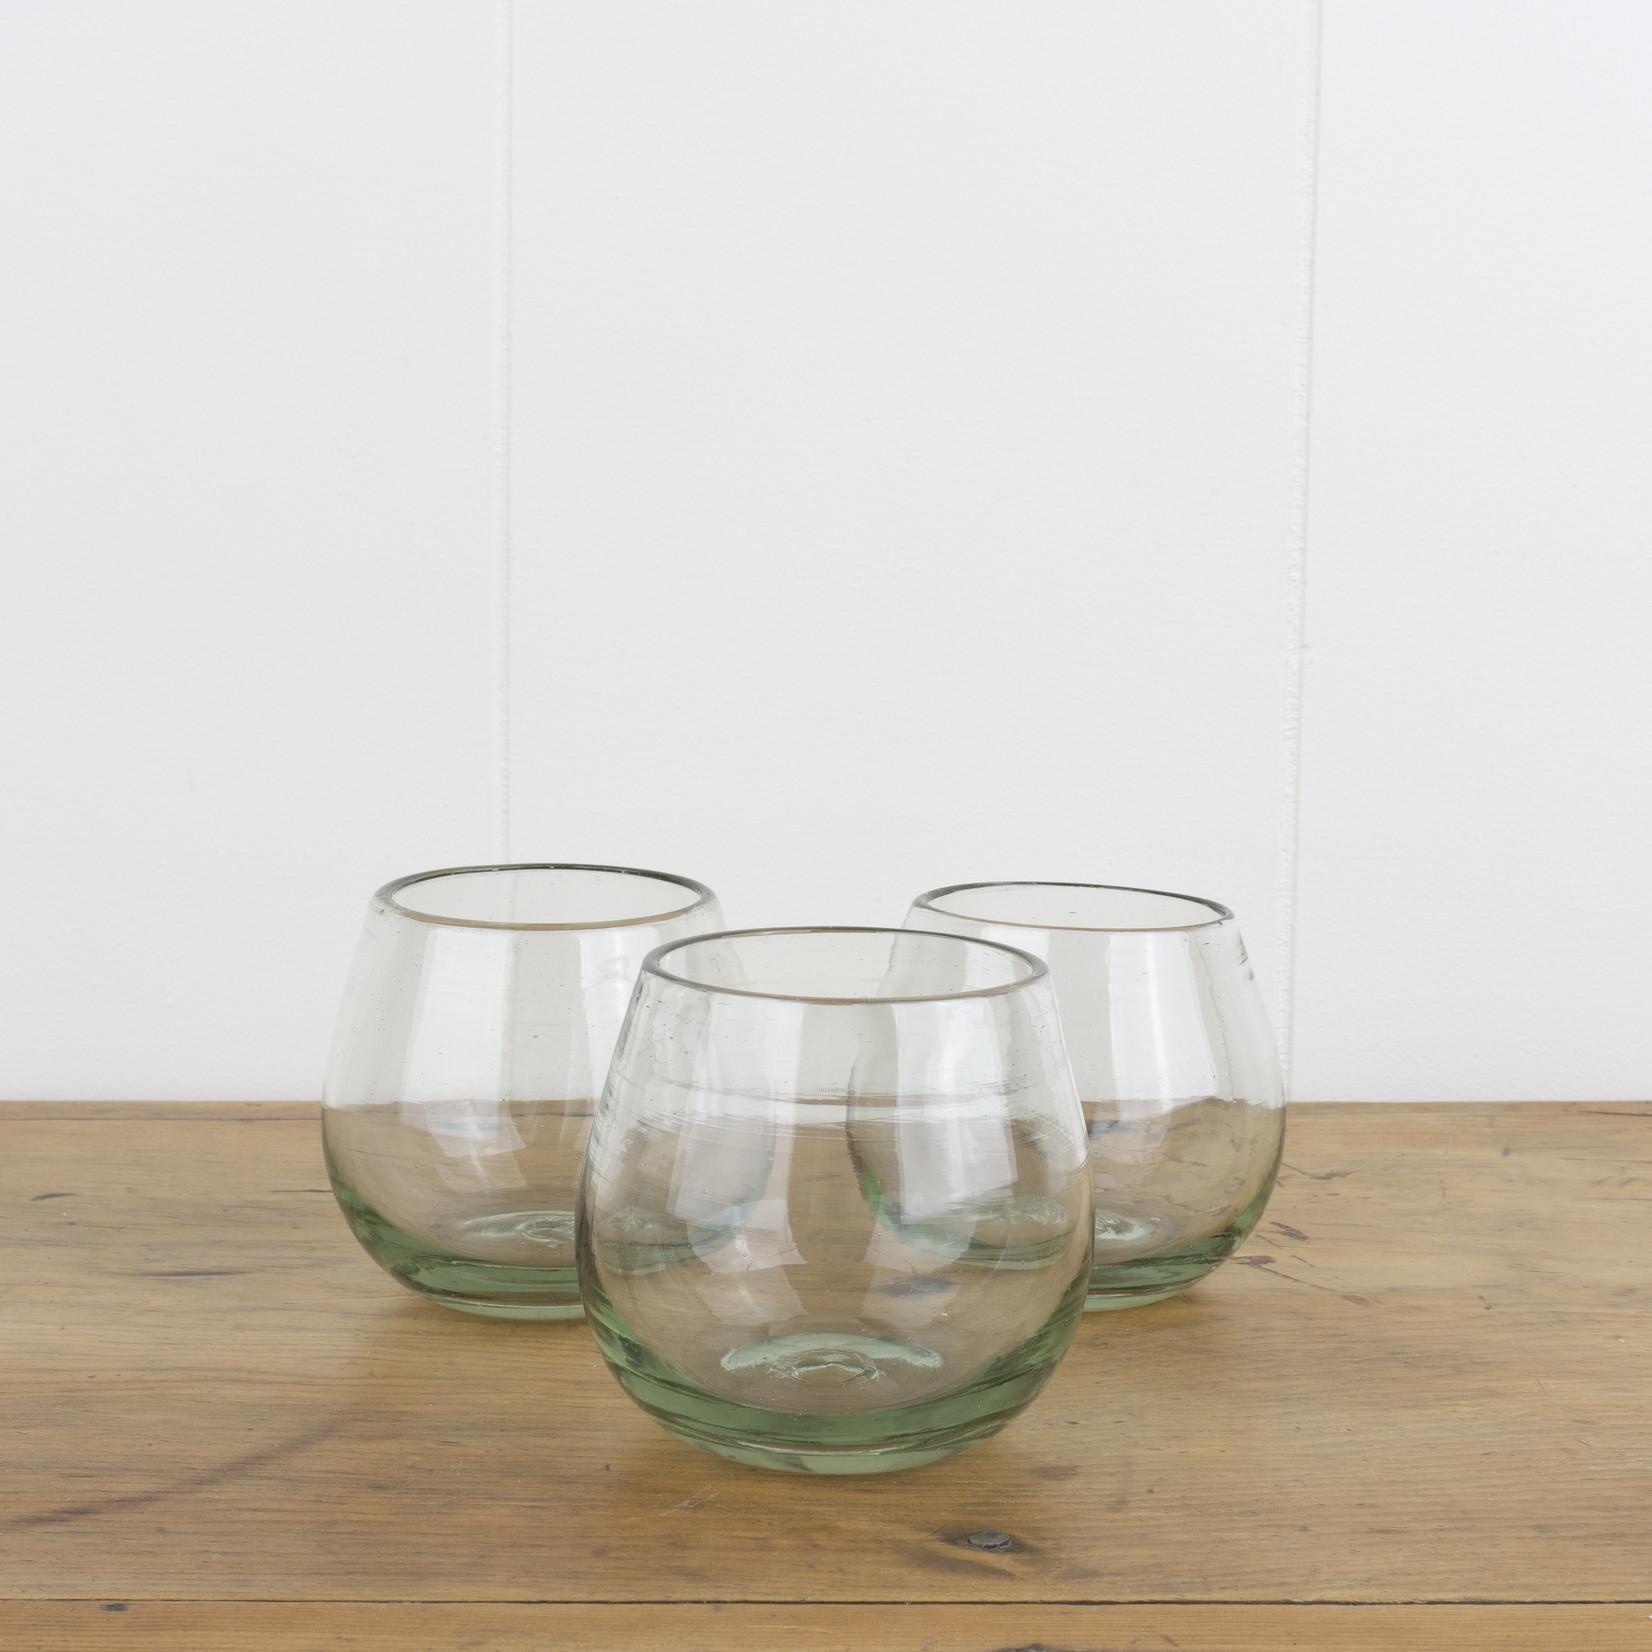 Handblown Roli Poli Glass- clear